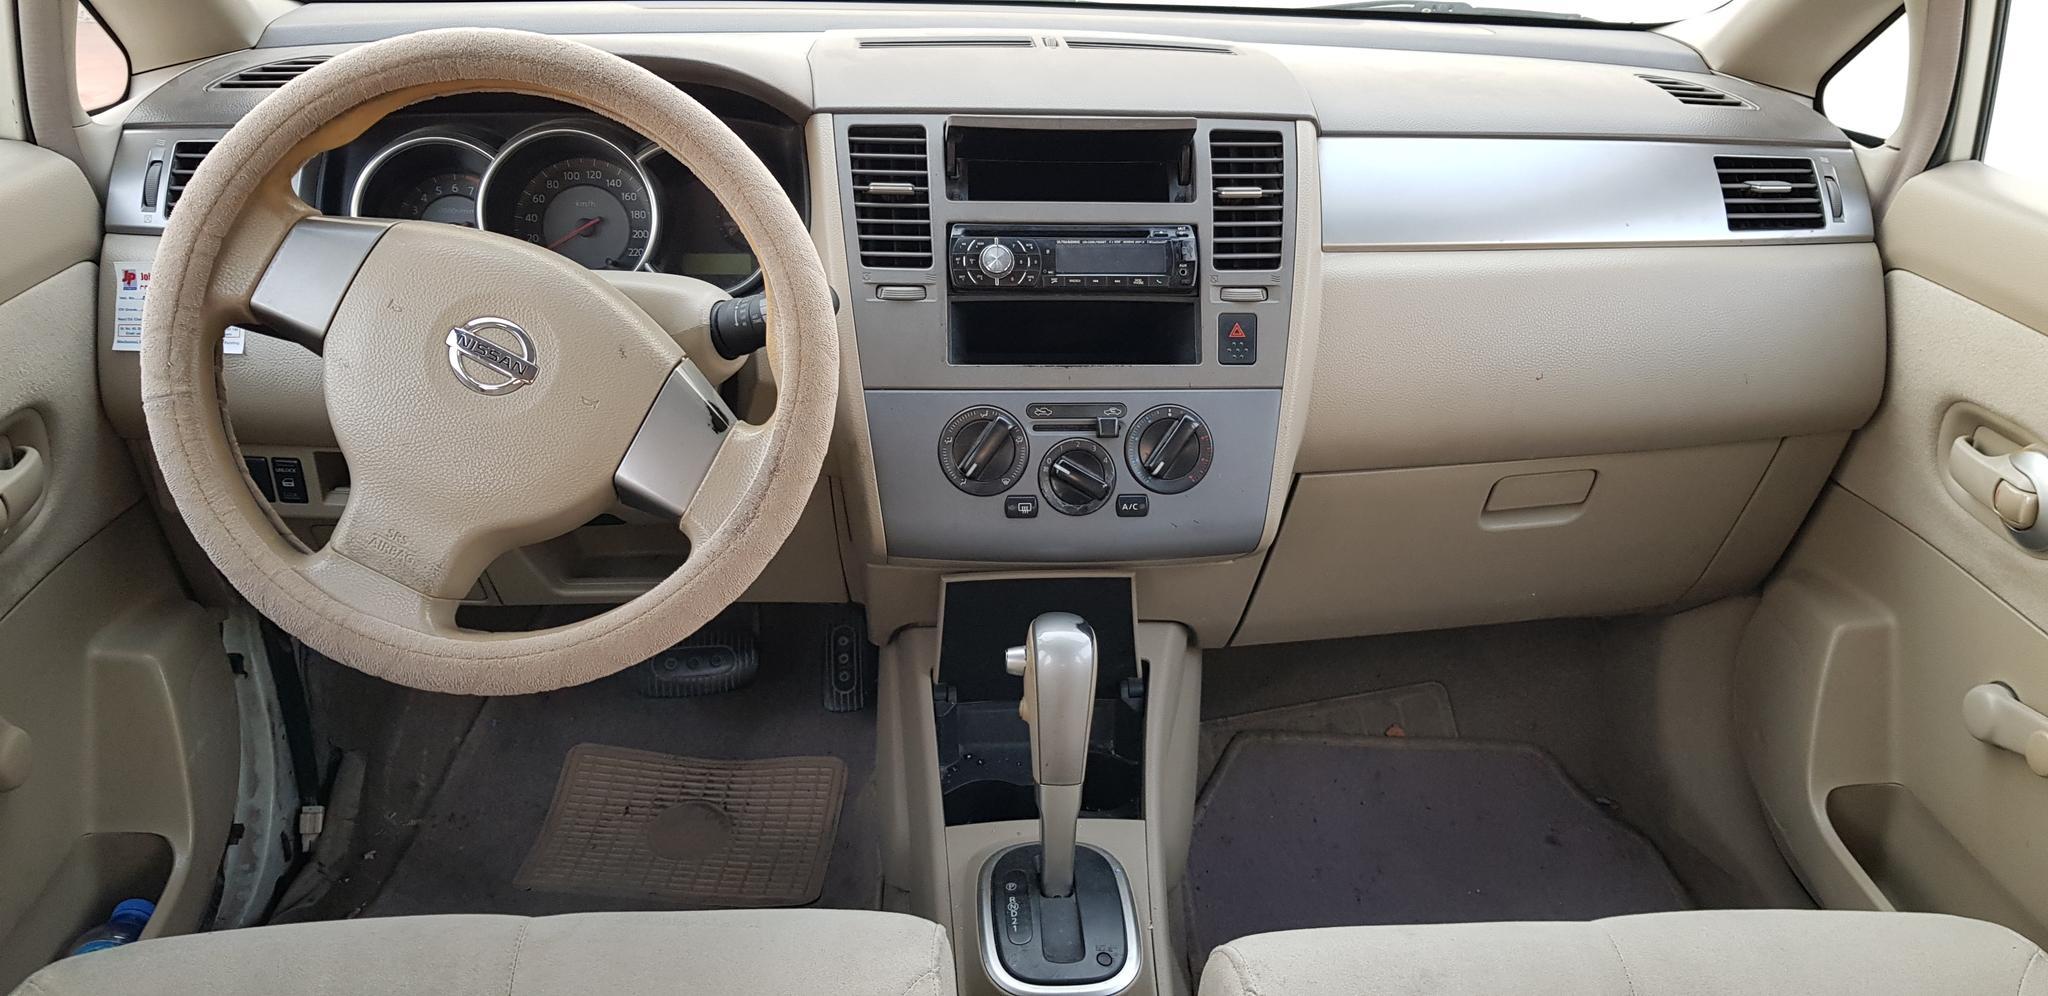 Nissan Tiida Hatchback new istimara Japan